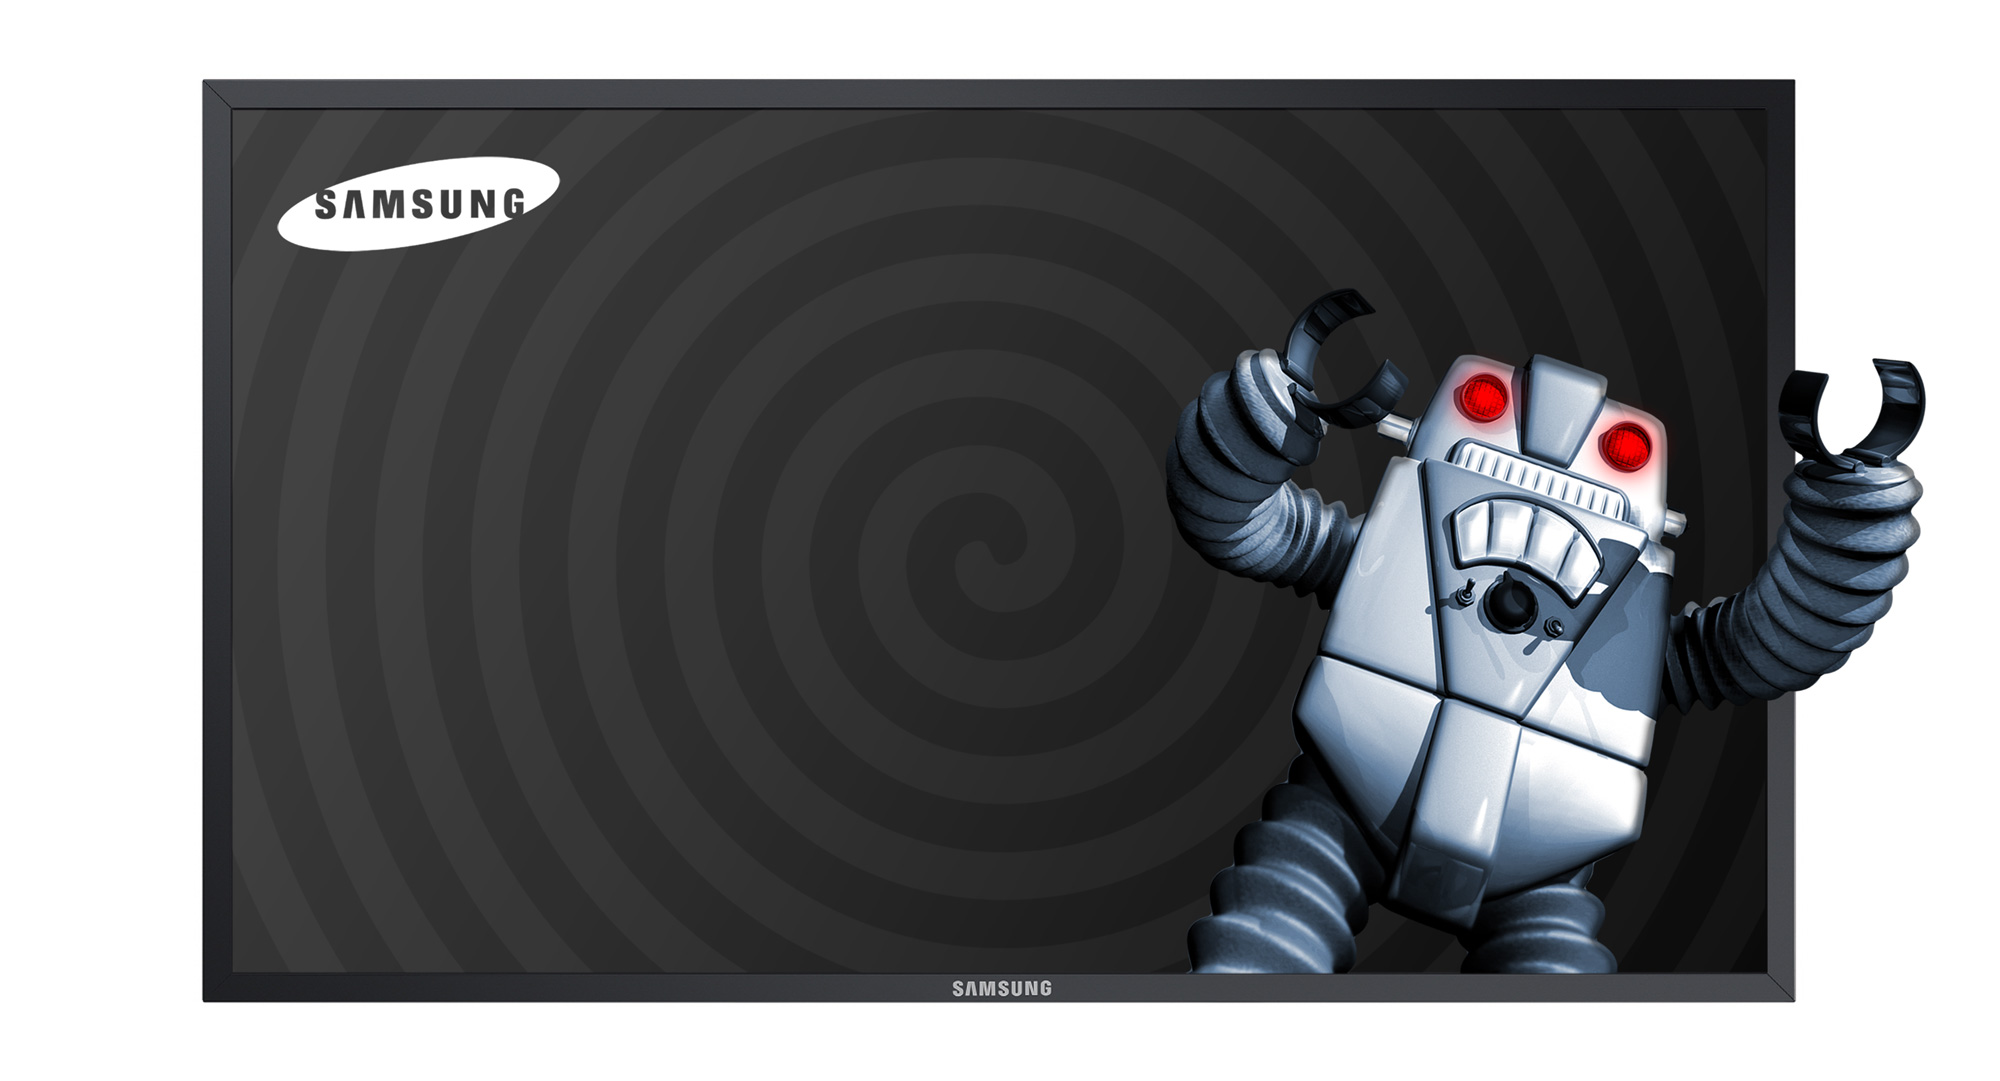 Samsung-DM85E-BR-front-w-robot.jpg